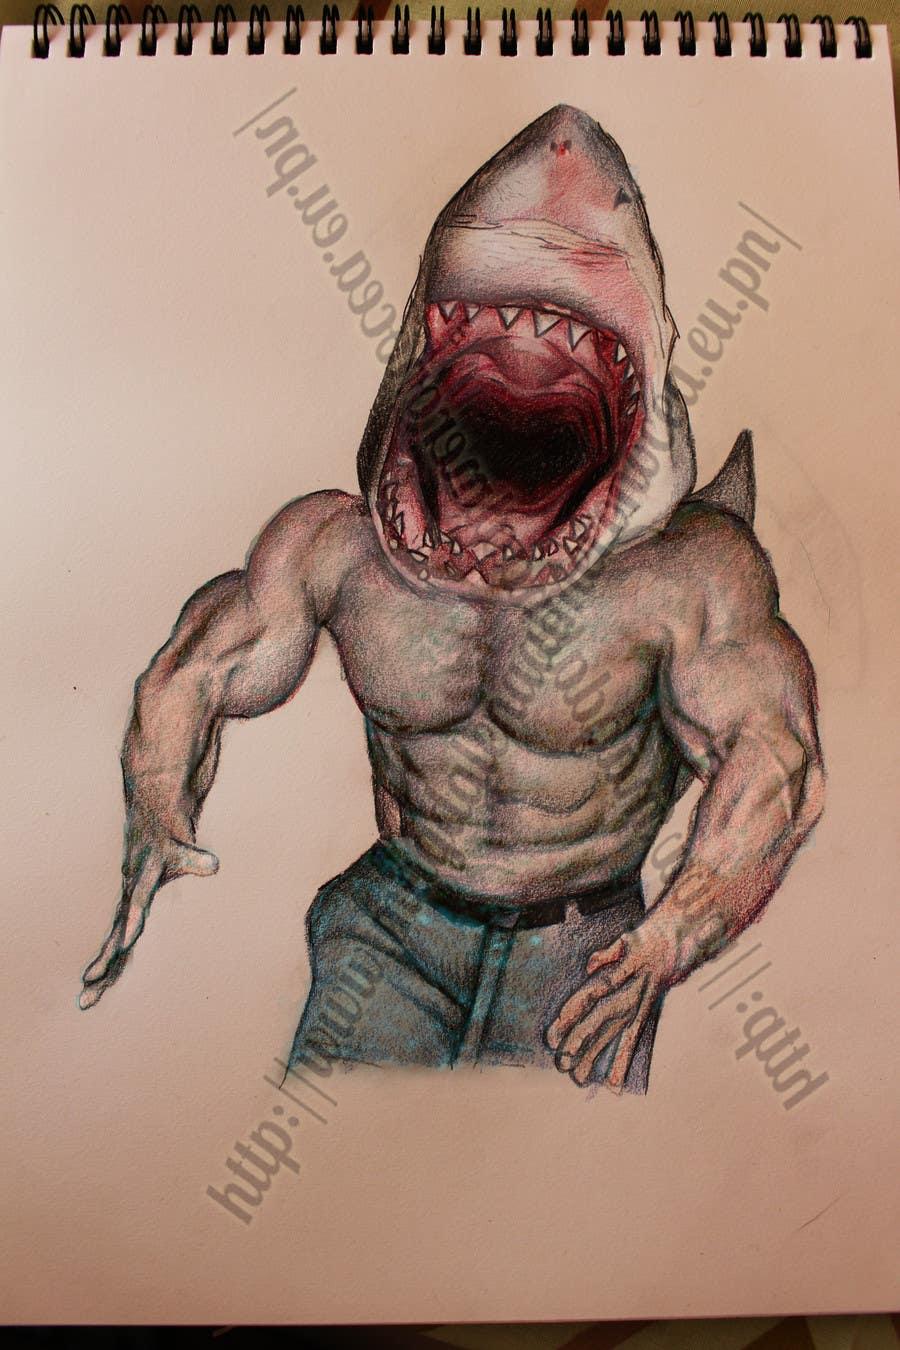 1000+ images about Sharpie91 on Pinterest | Sharpie91 ... |Half Human Half Shark